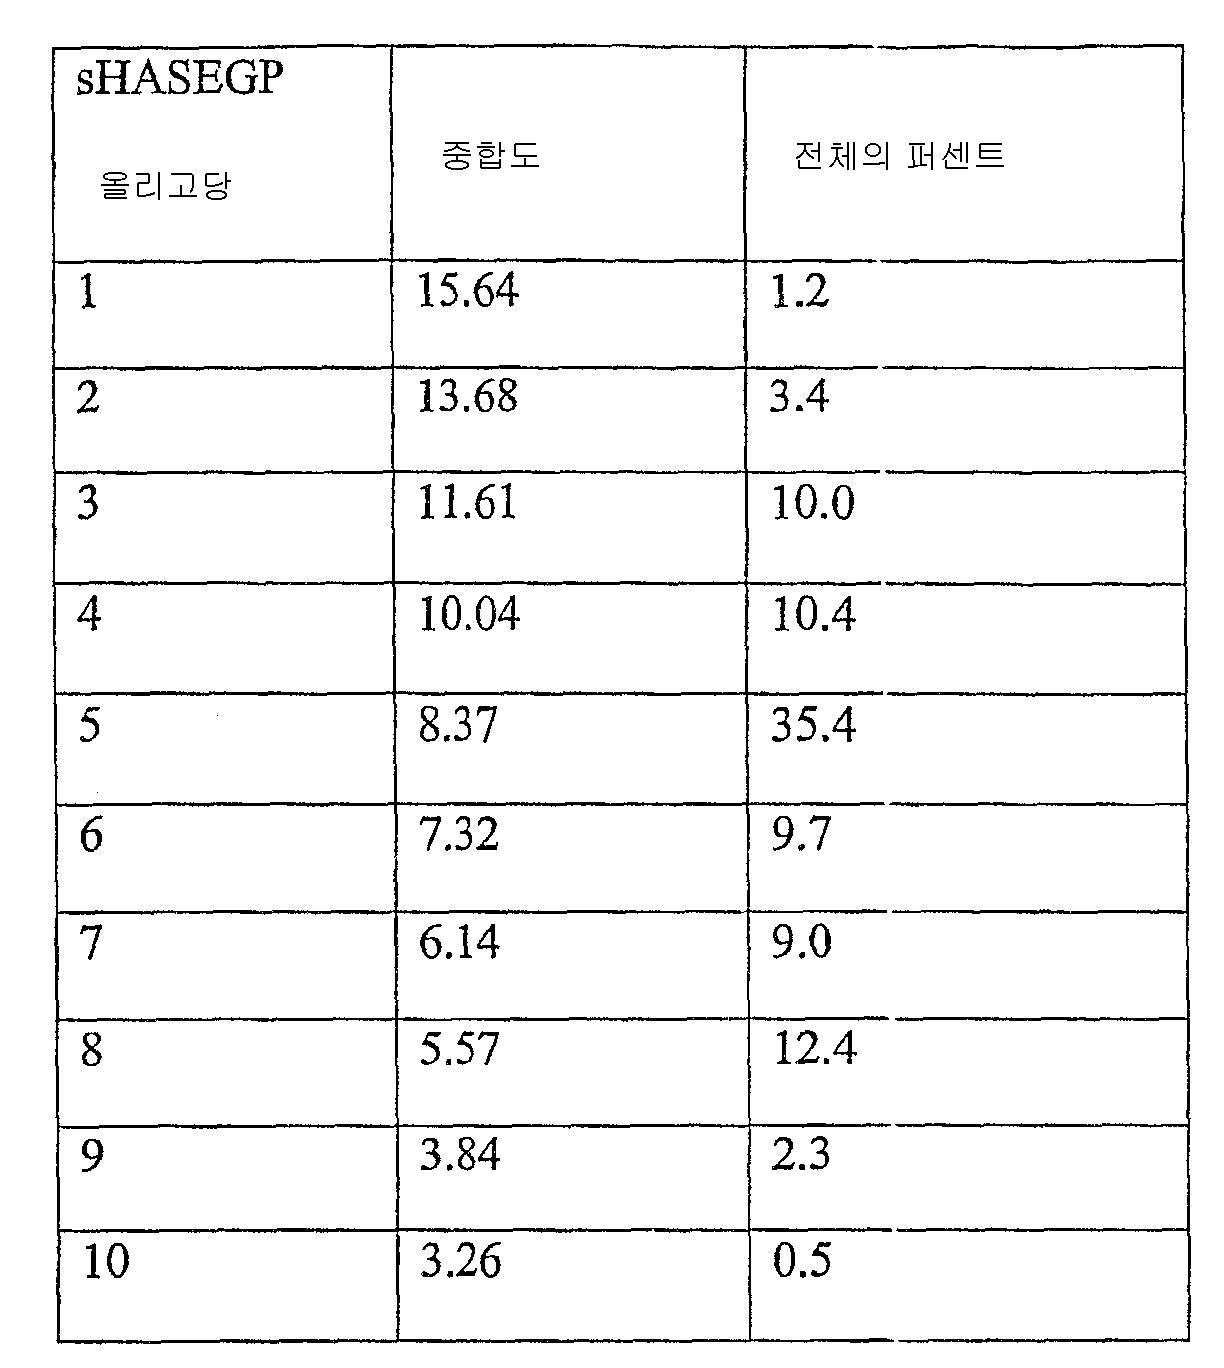 Din 66001 Pdf